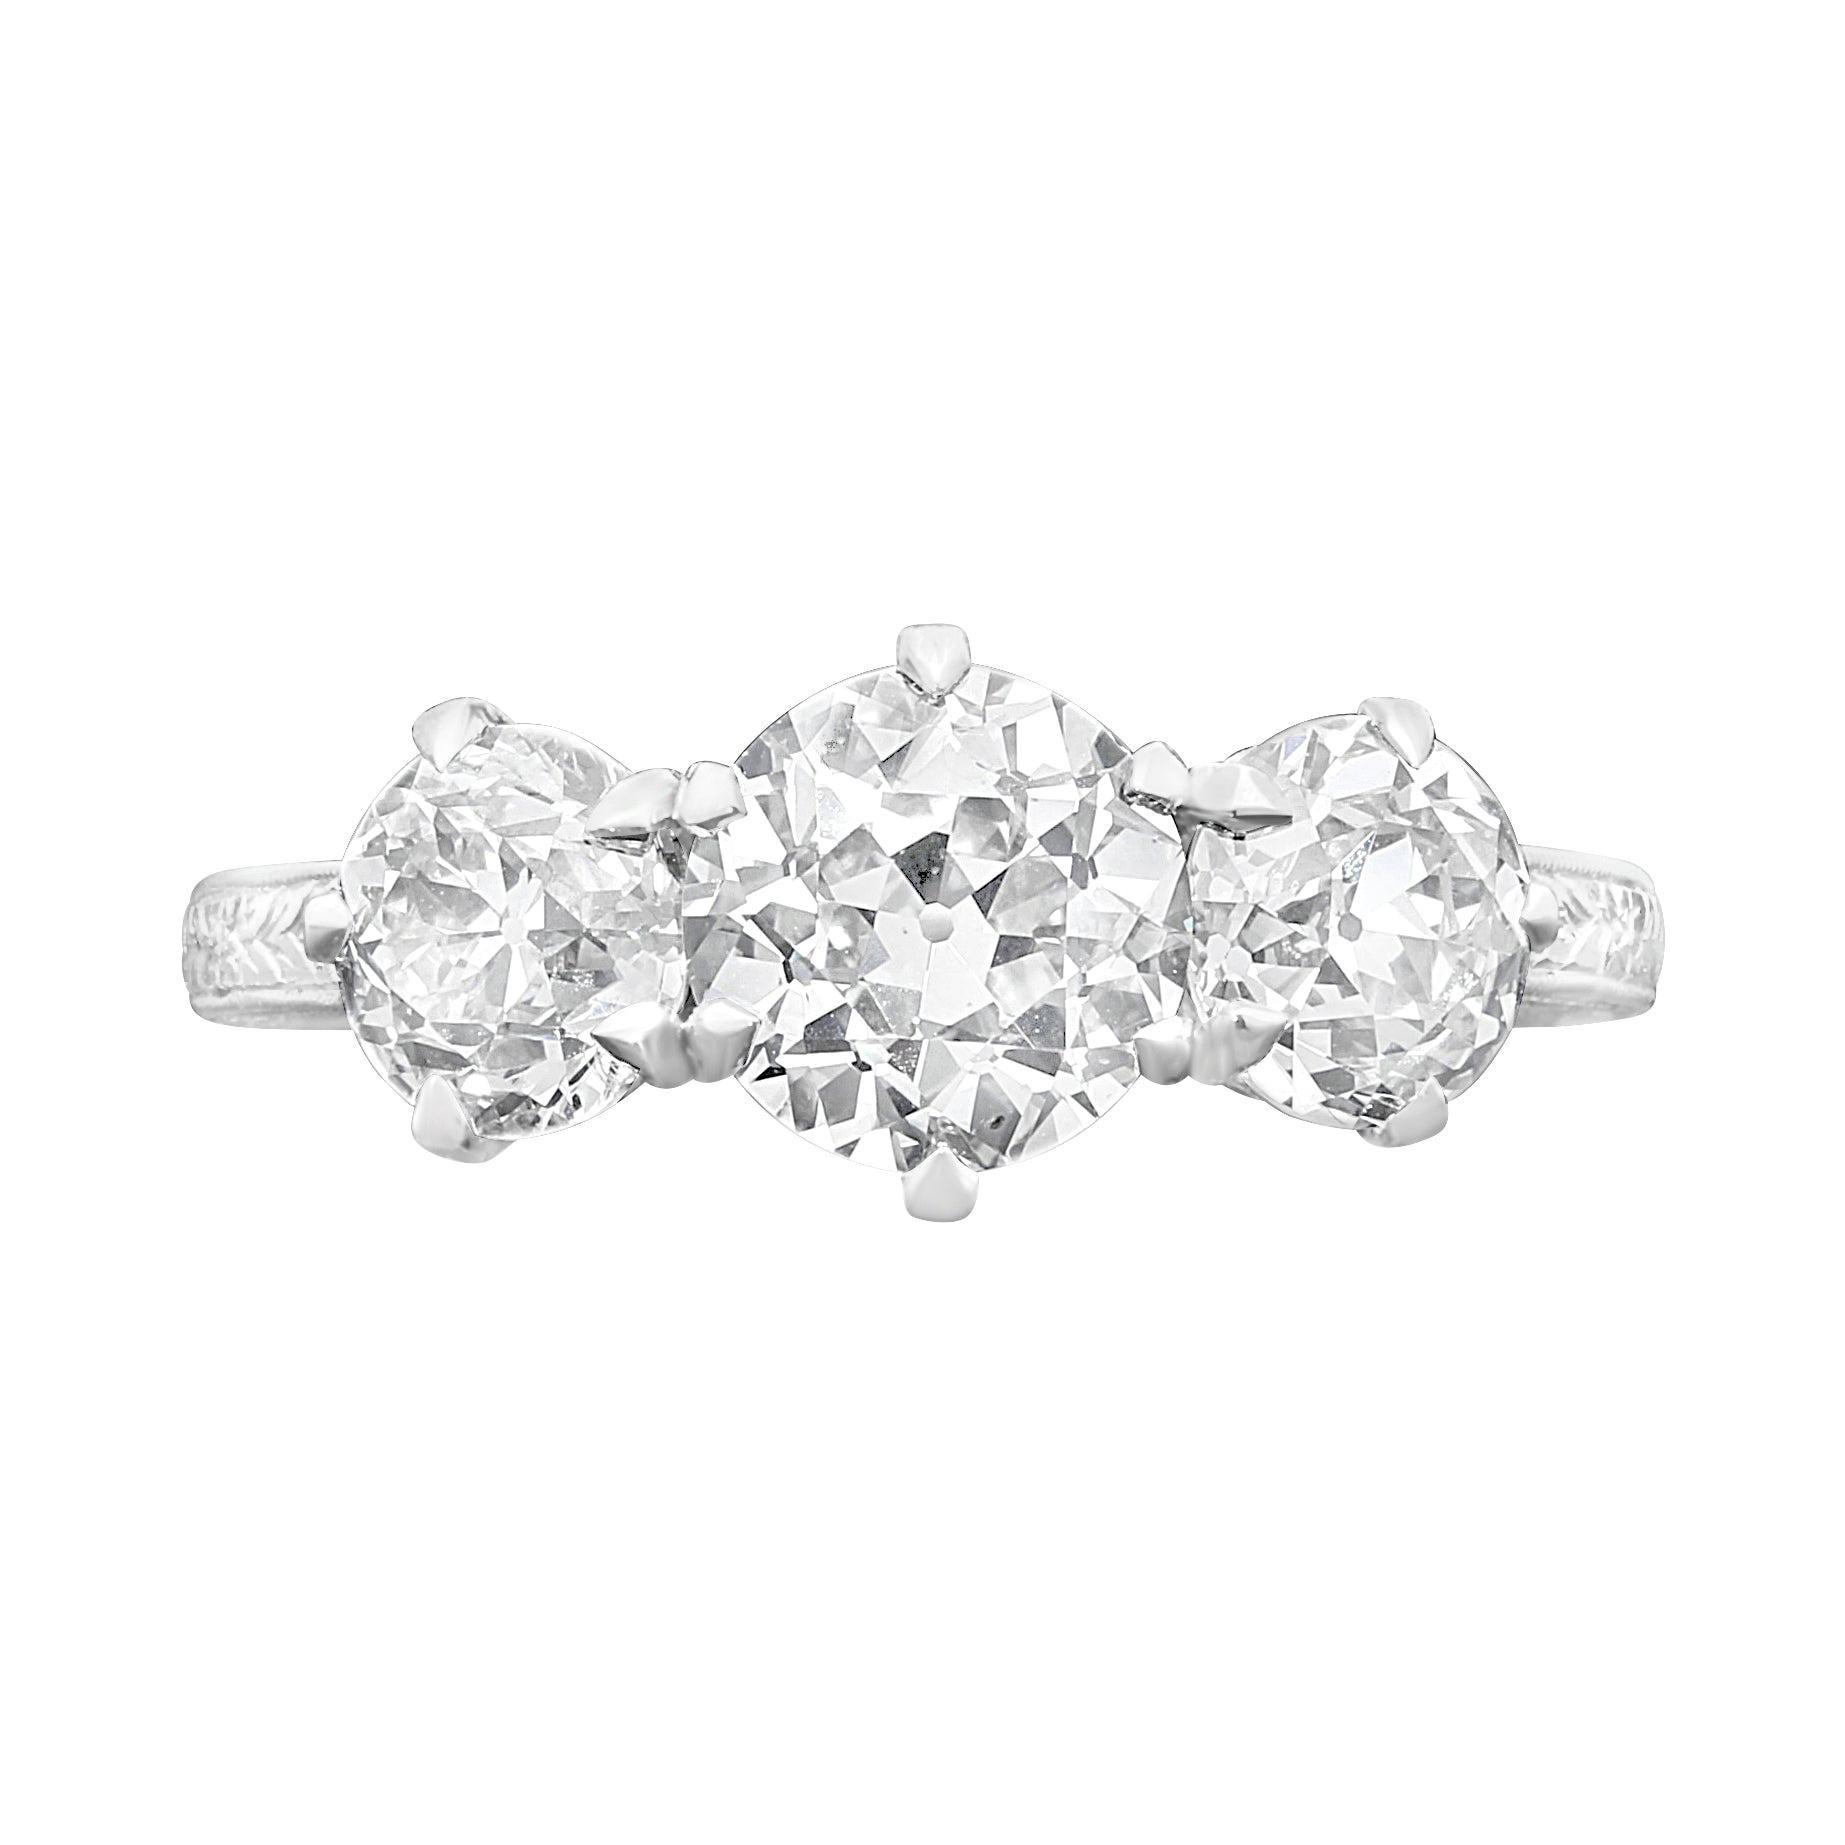 Hancocks 2.62 Carat Diamond Three-Stone Ring in Finely Hand Engraved Platinum